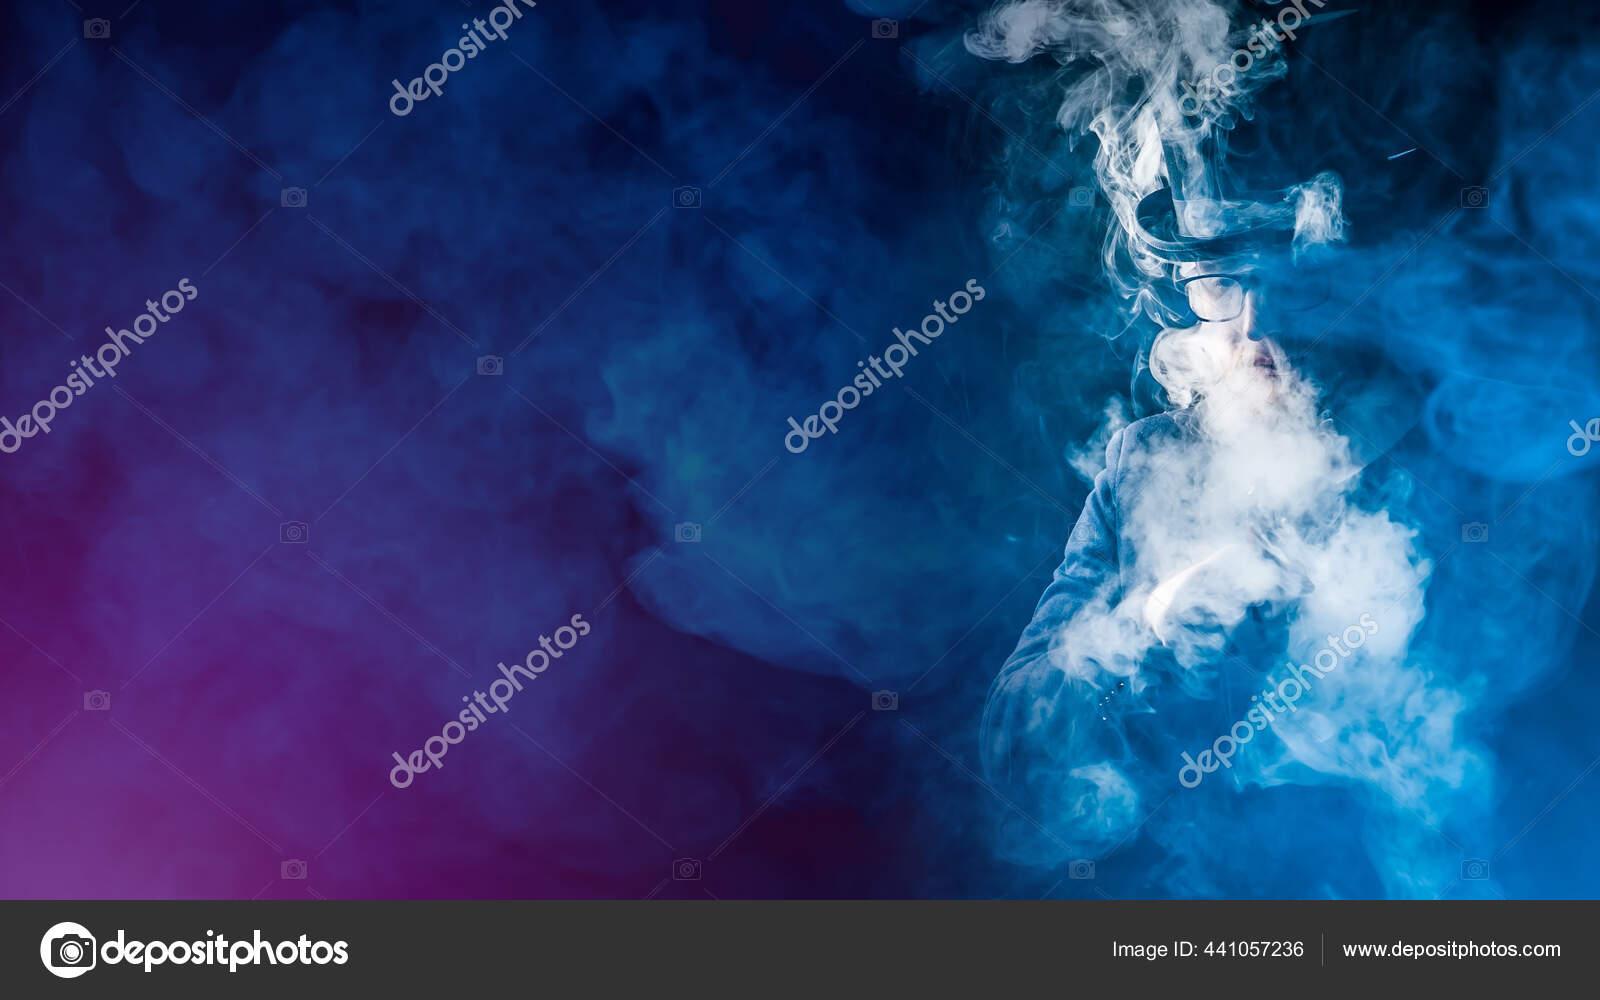 Latar Belakang Vape Berasap Vaper Awan Asap Seorang Pria Dengan — Stok Foto  © GrinPhoto #441057236